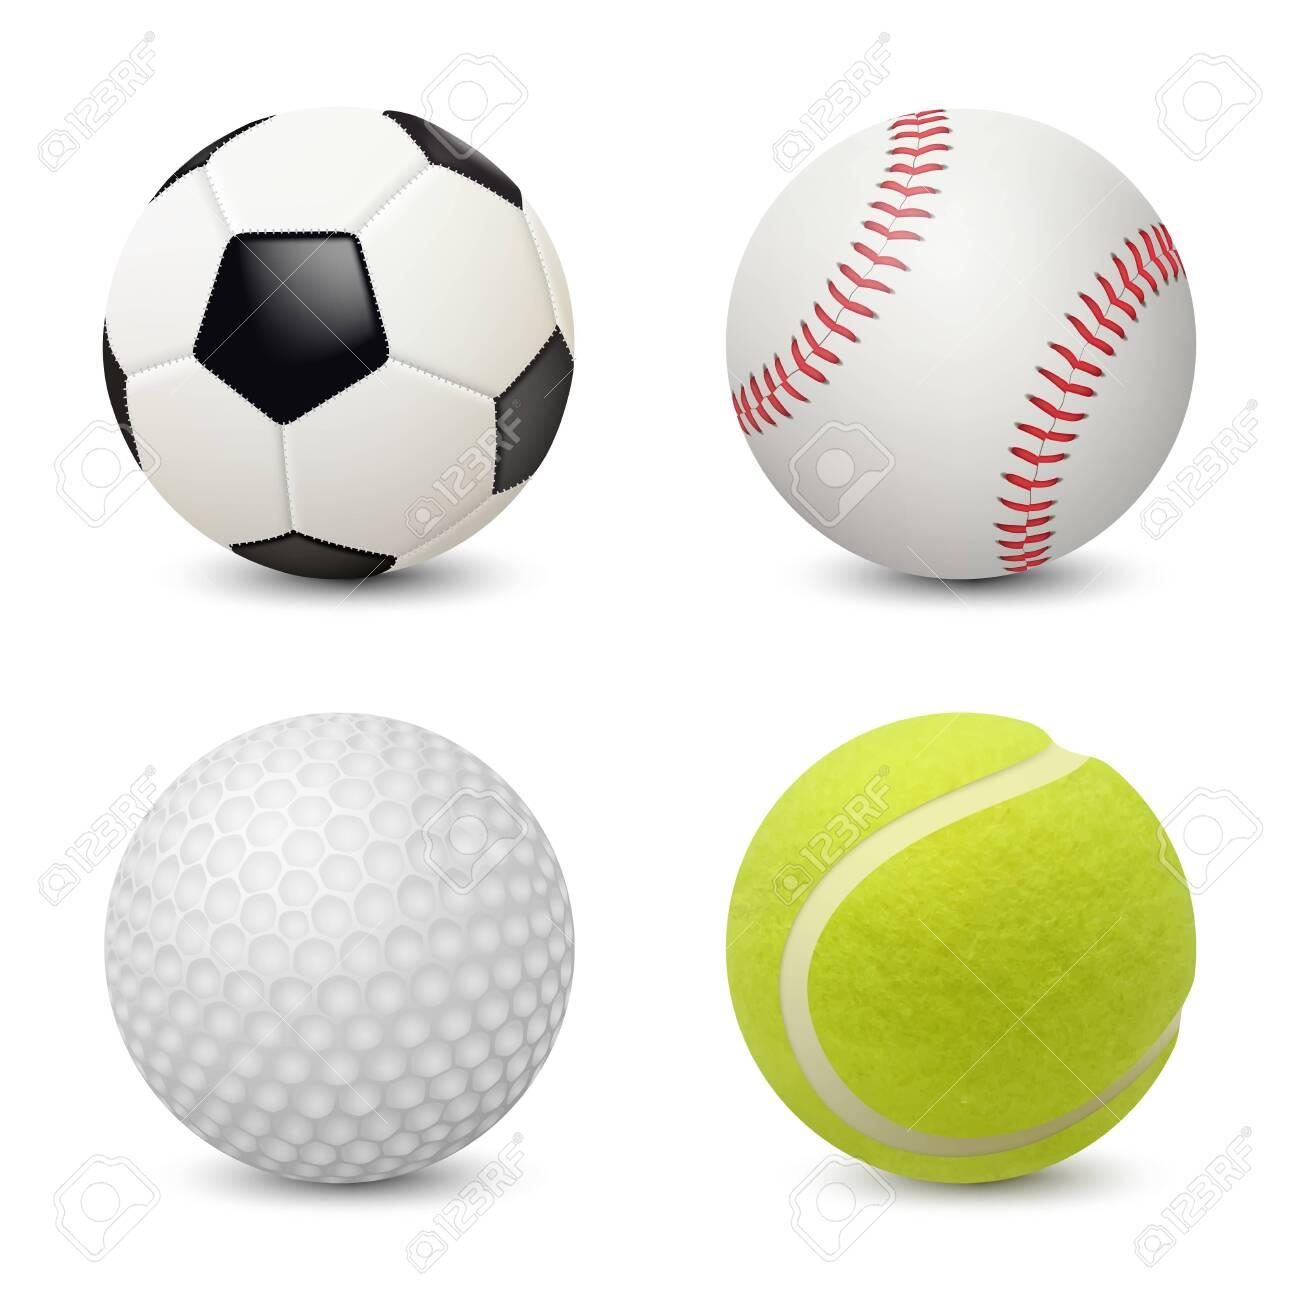 Sport balls. Baseball football tennis golf vector realistic sport equipment. Illustration of golf ball and football, tennis and soccer - 129116728